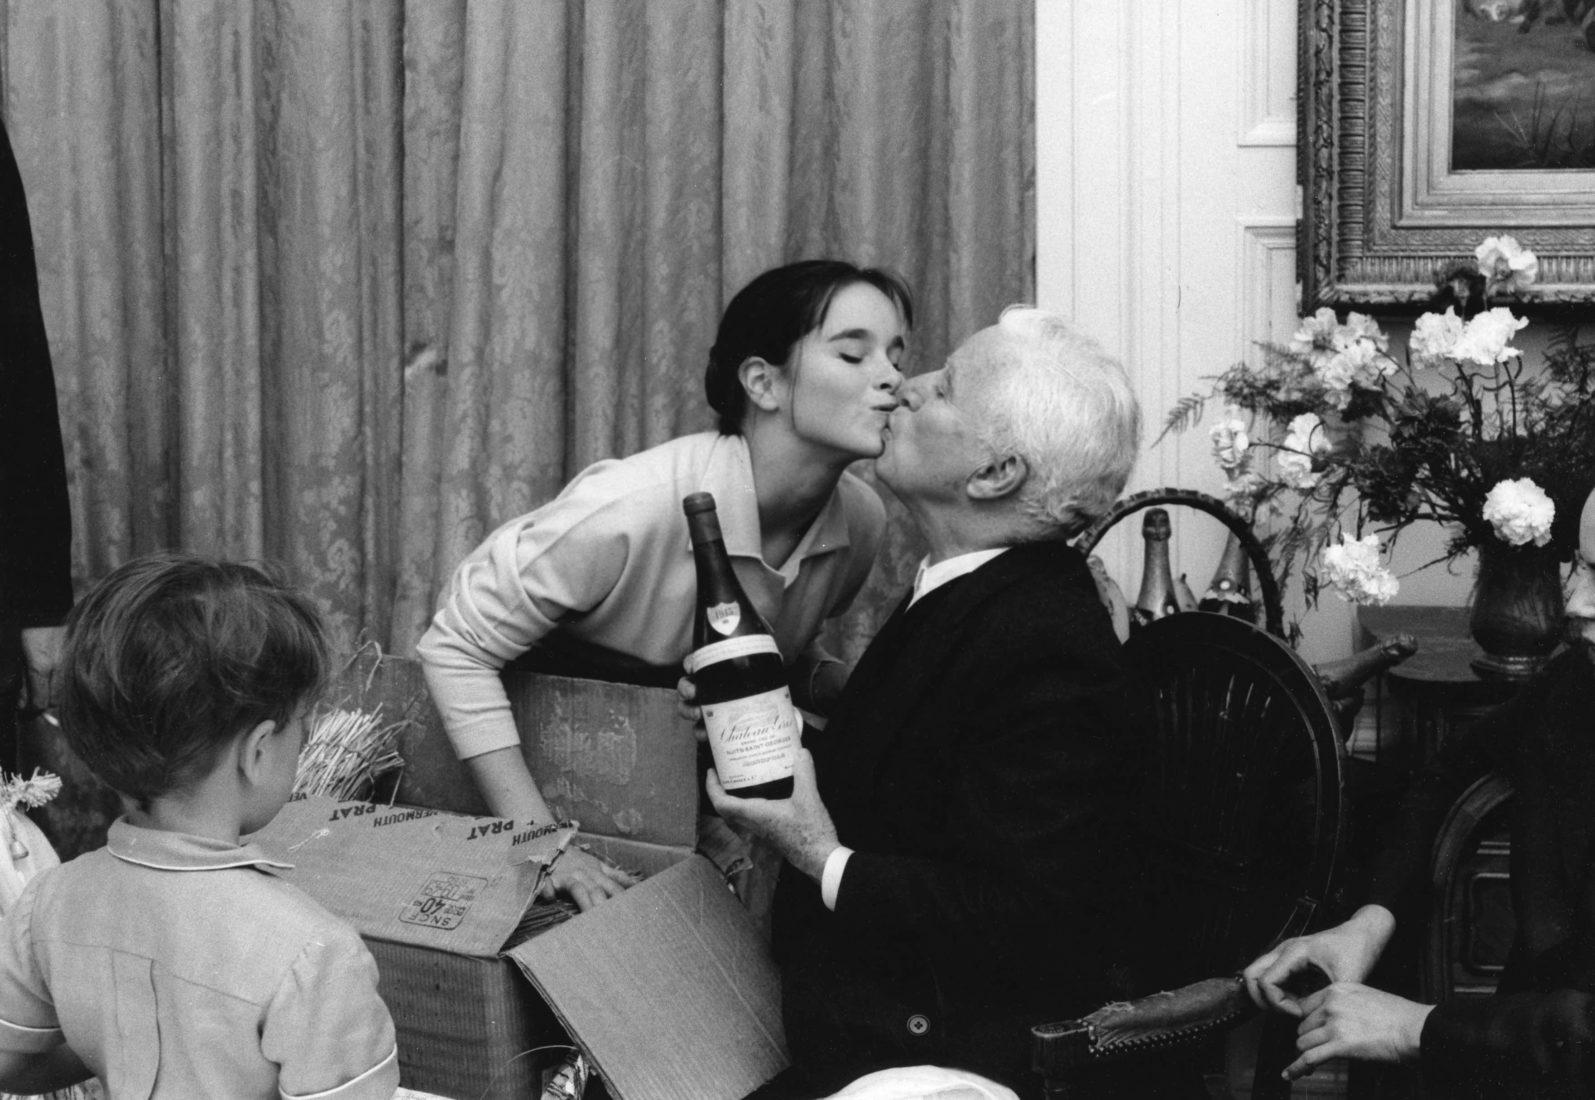 Manoir de Ban_anniversaire_1959 YVES DEBRAINE